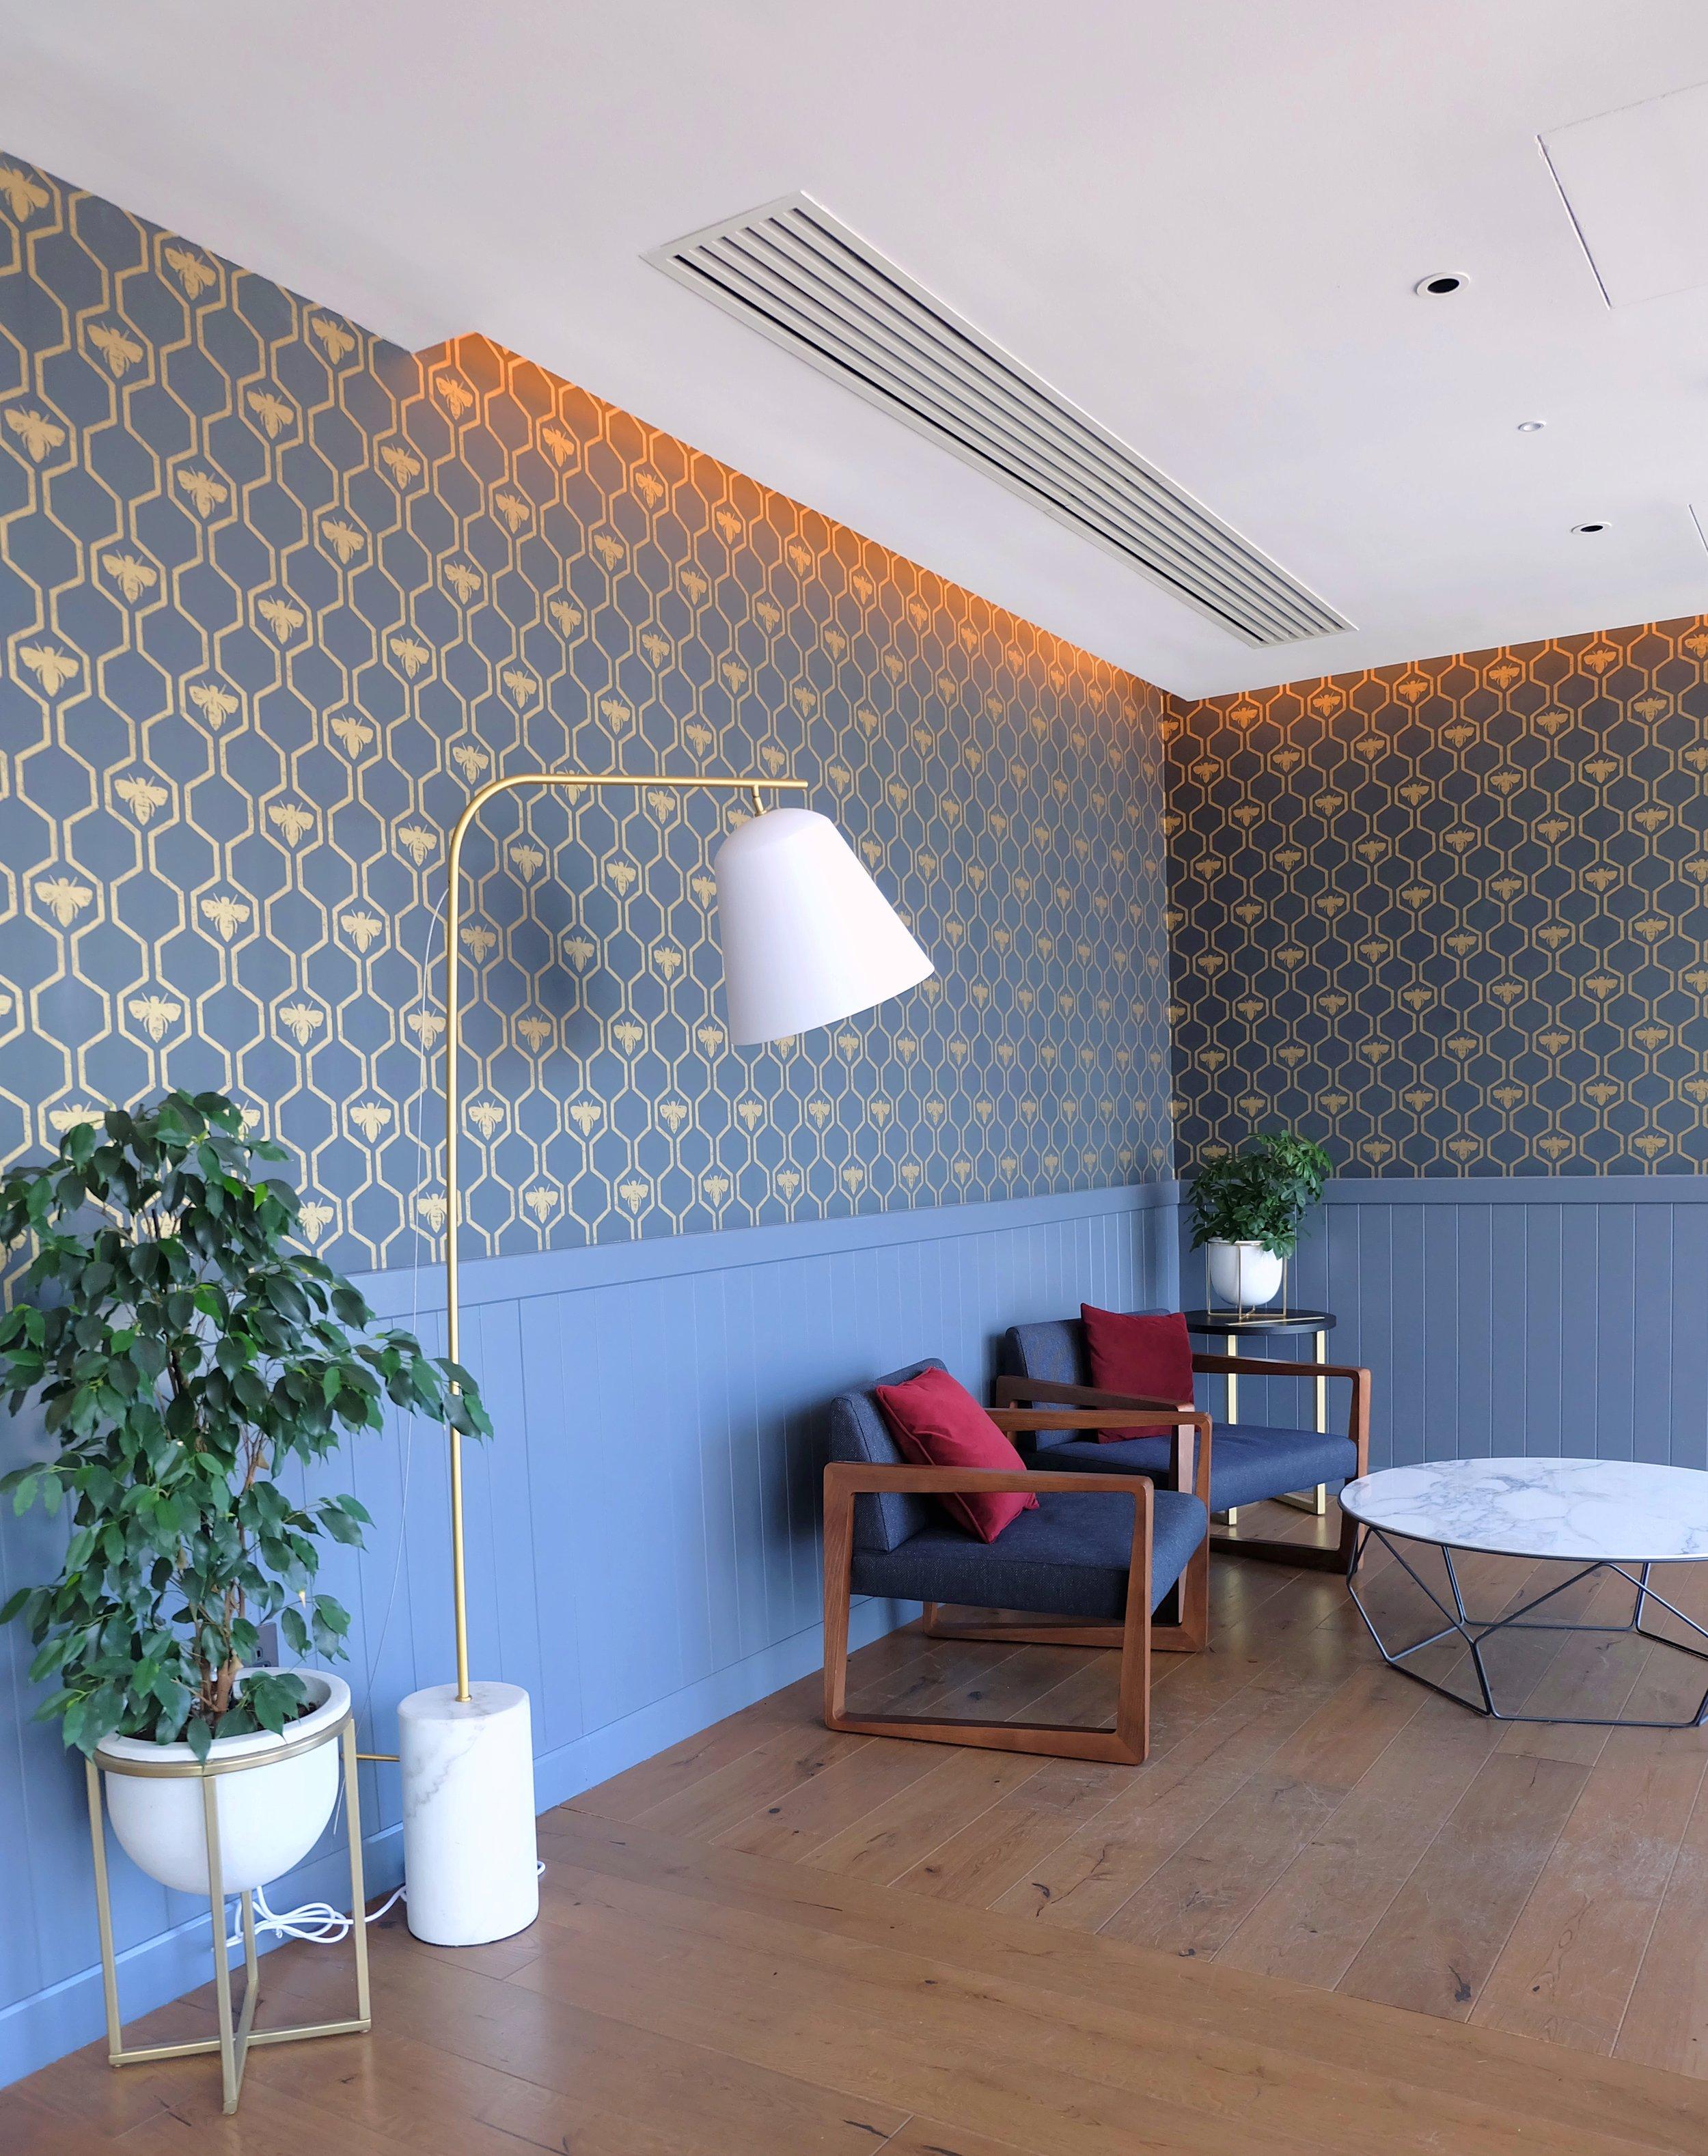 Staybridge Suites Oxford Road